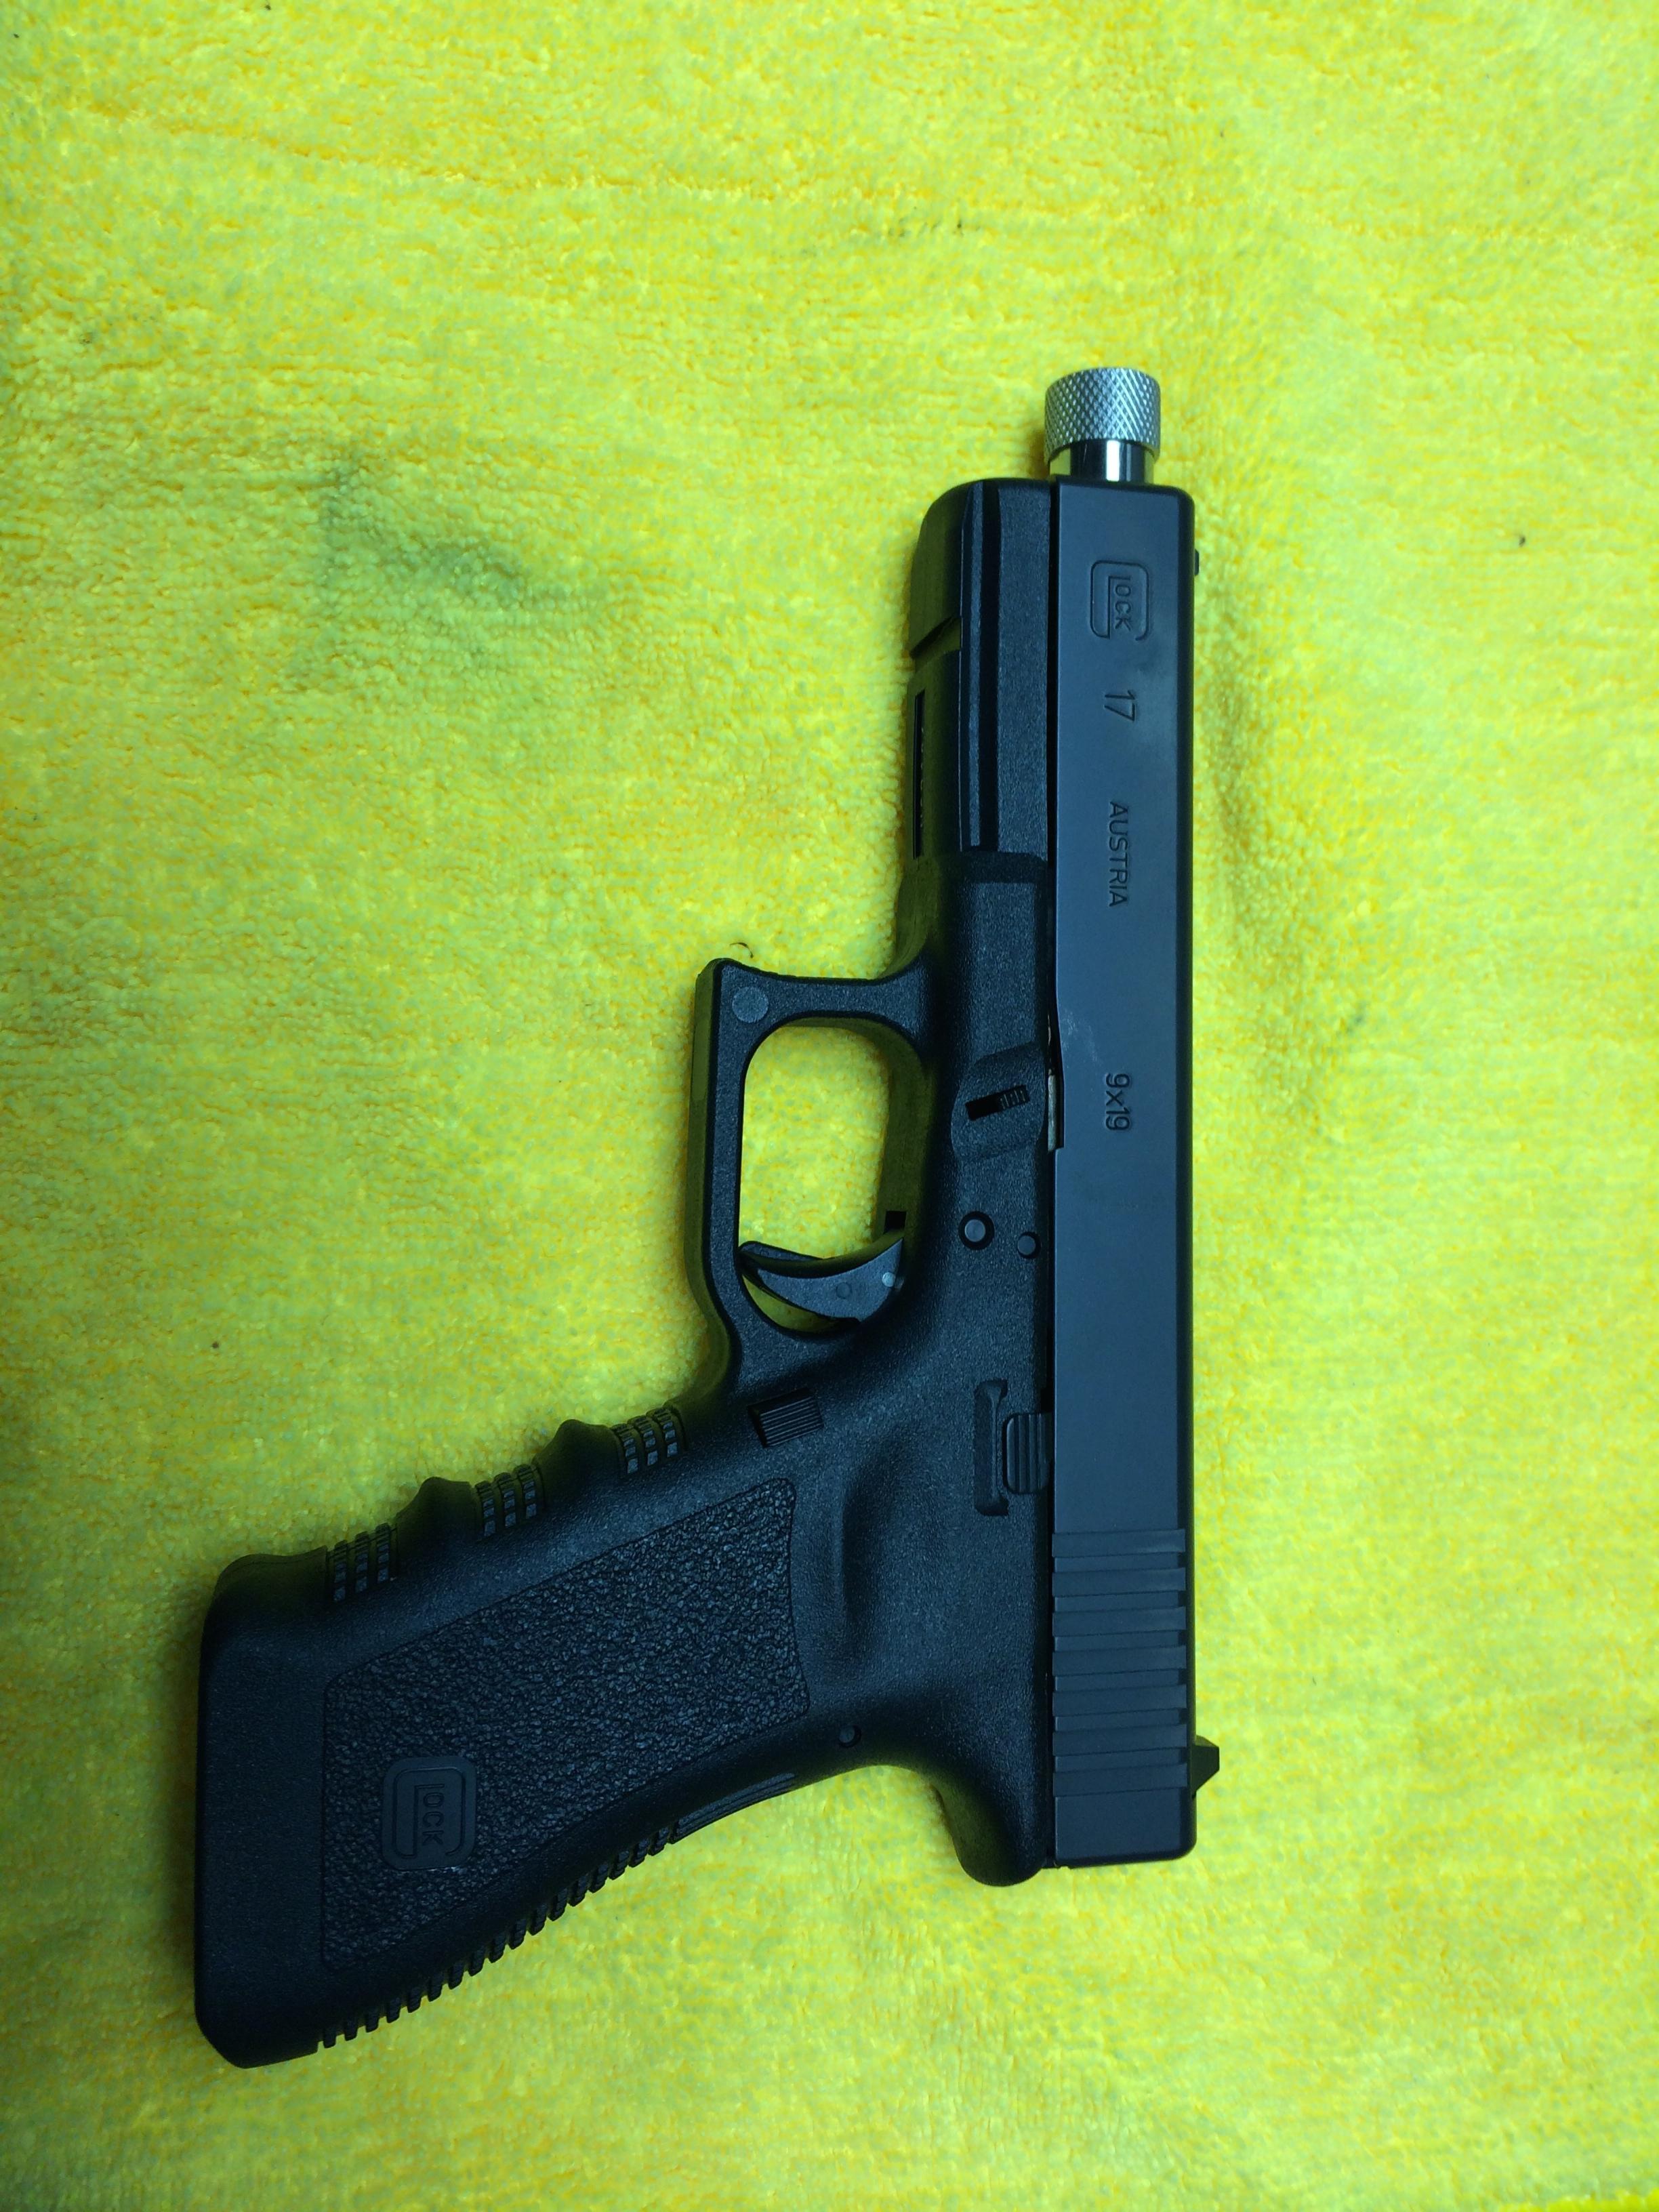 Glock 17, Lone Wolf barrel and raised sights-img_0261.jpg